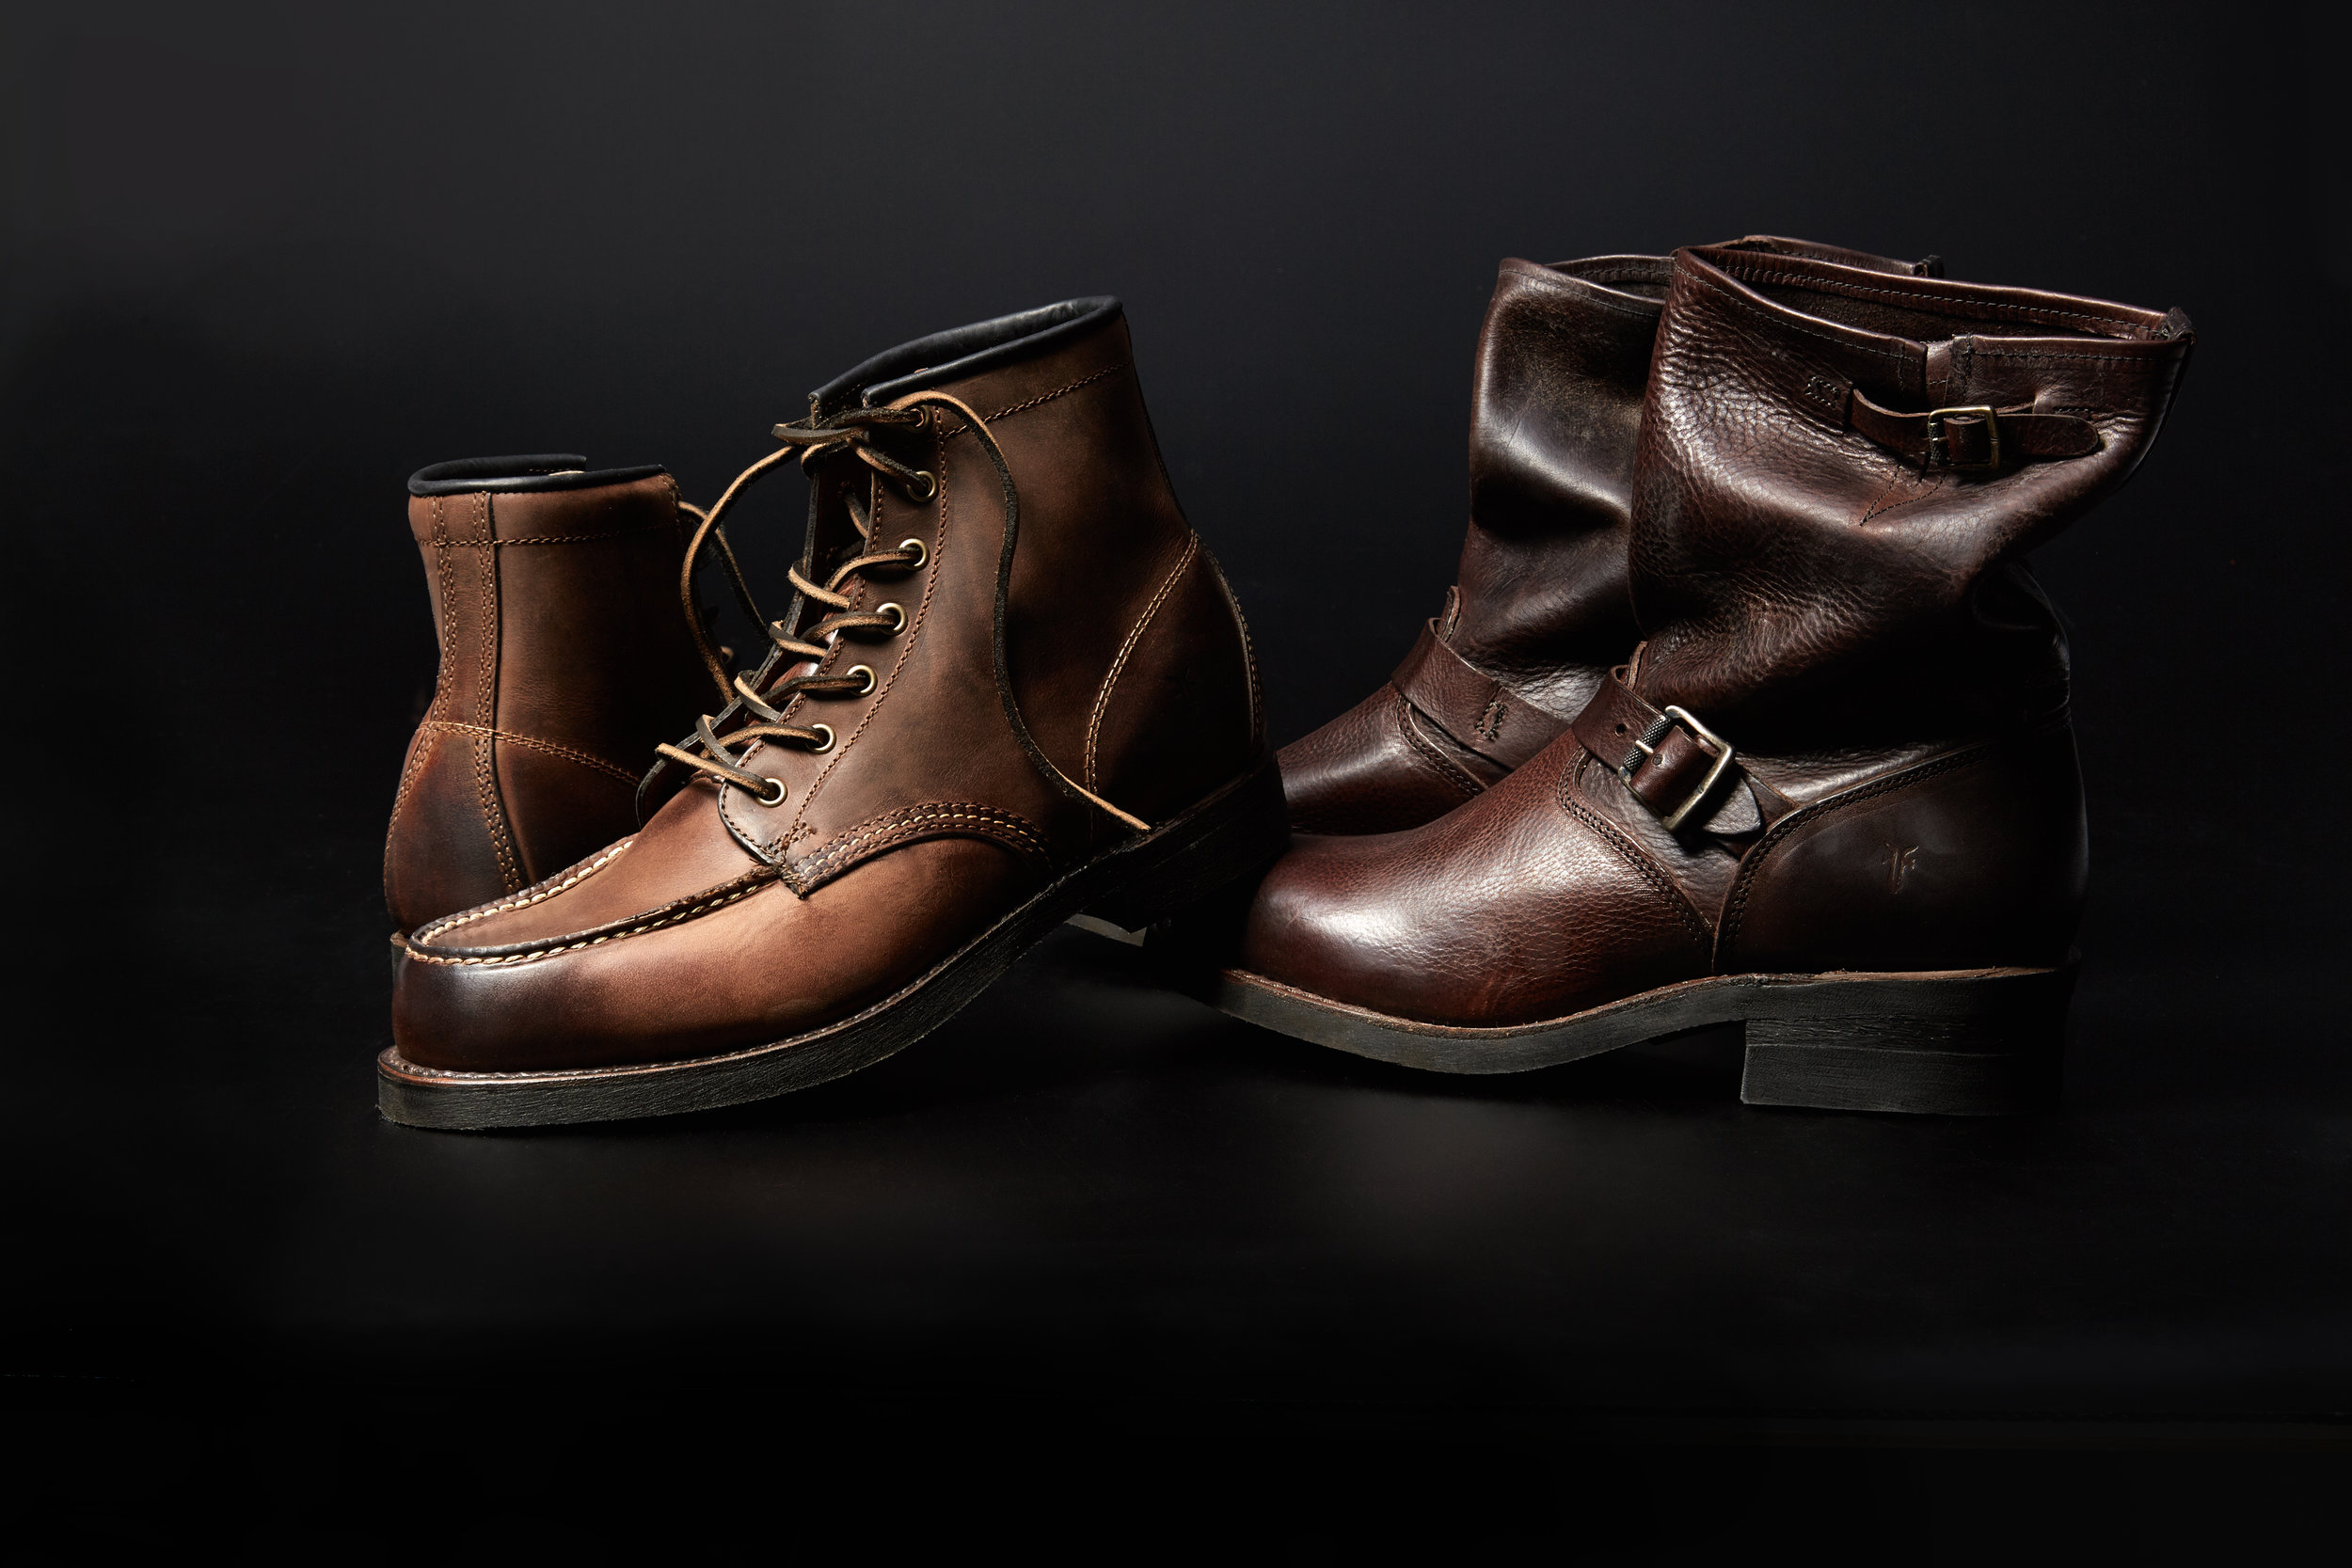 Boots_MACC_1138403704_BASE.jpg